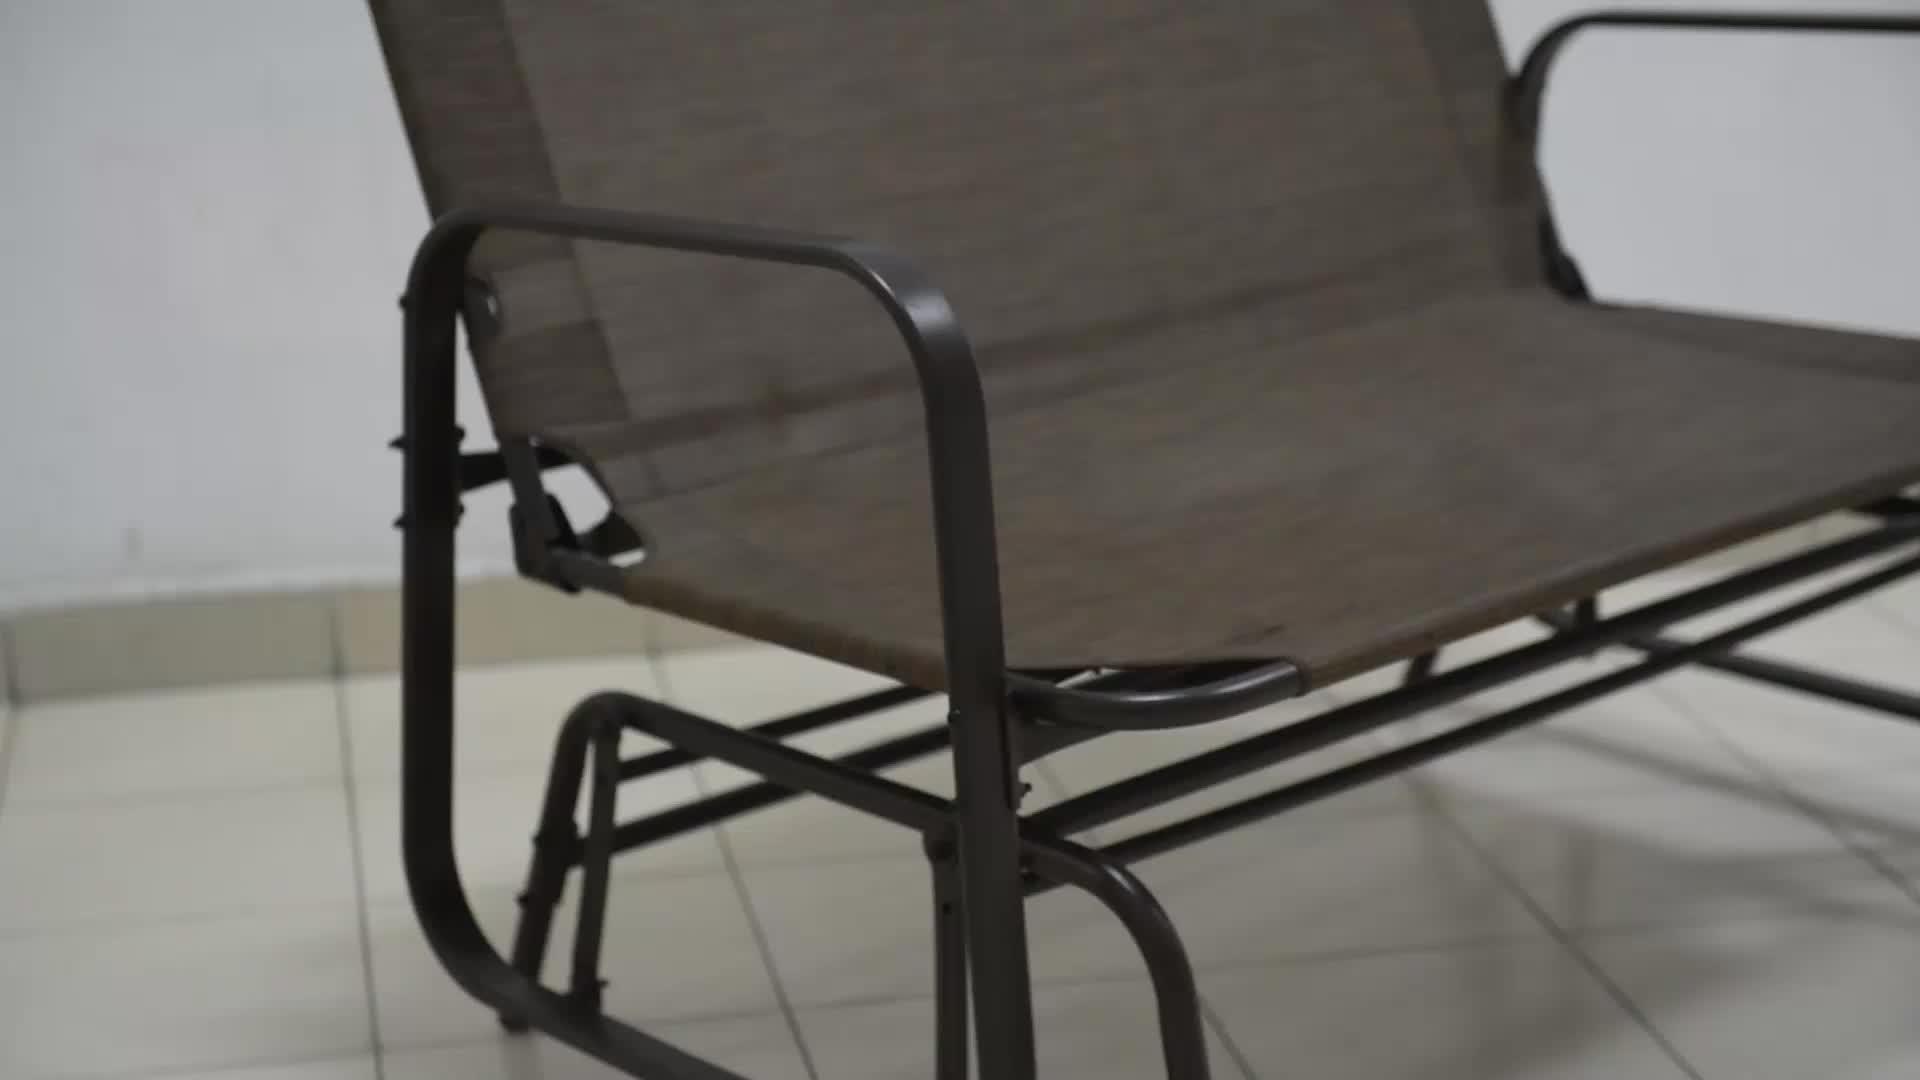 Outdoor Garden Steel Frame Patio Swing Glider Loveseat Bench Rocking Chair  – Buy Outdoor Garden Bench,metal Garden Bench,glider Rocking Chair Product Inside Outdoor Patio Swing Porch Rocker Glider Benches Loveseat Garden Seat Steel (View 15 of 25)